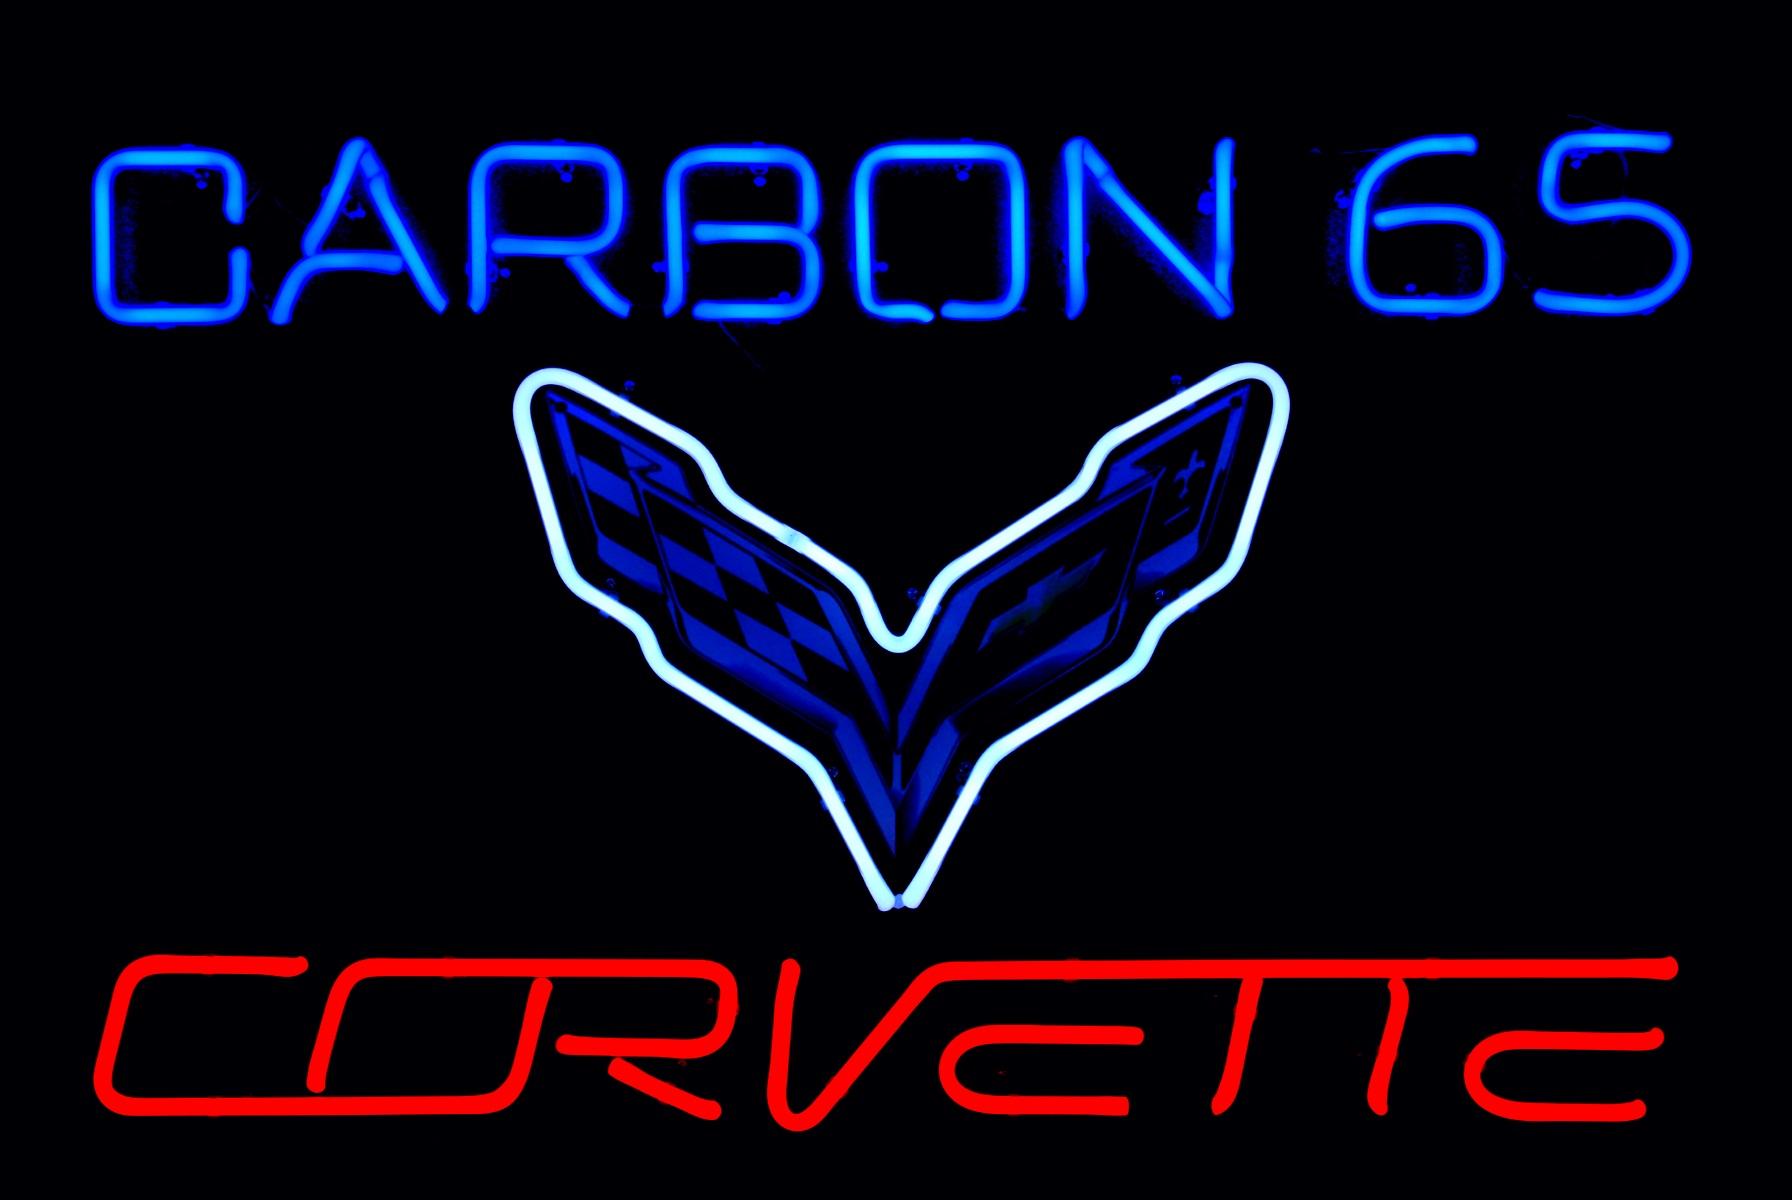 New Car Dealership Showroom Neon Signs by John Barton - BartonNeonMagic.com